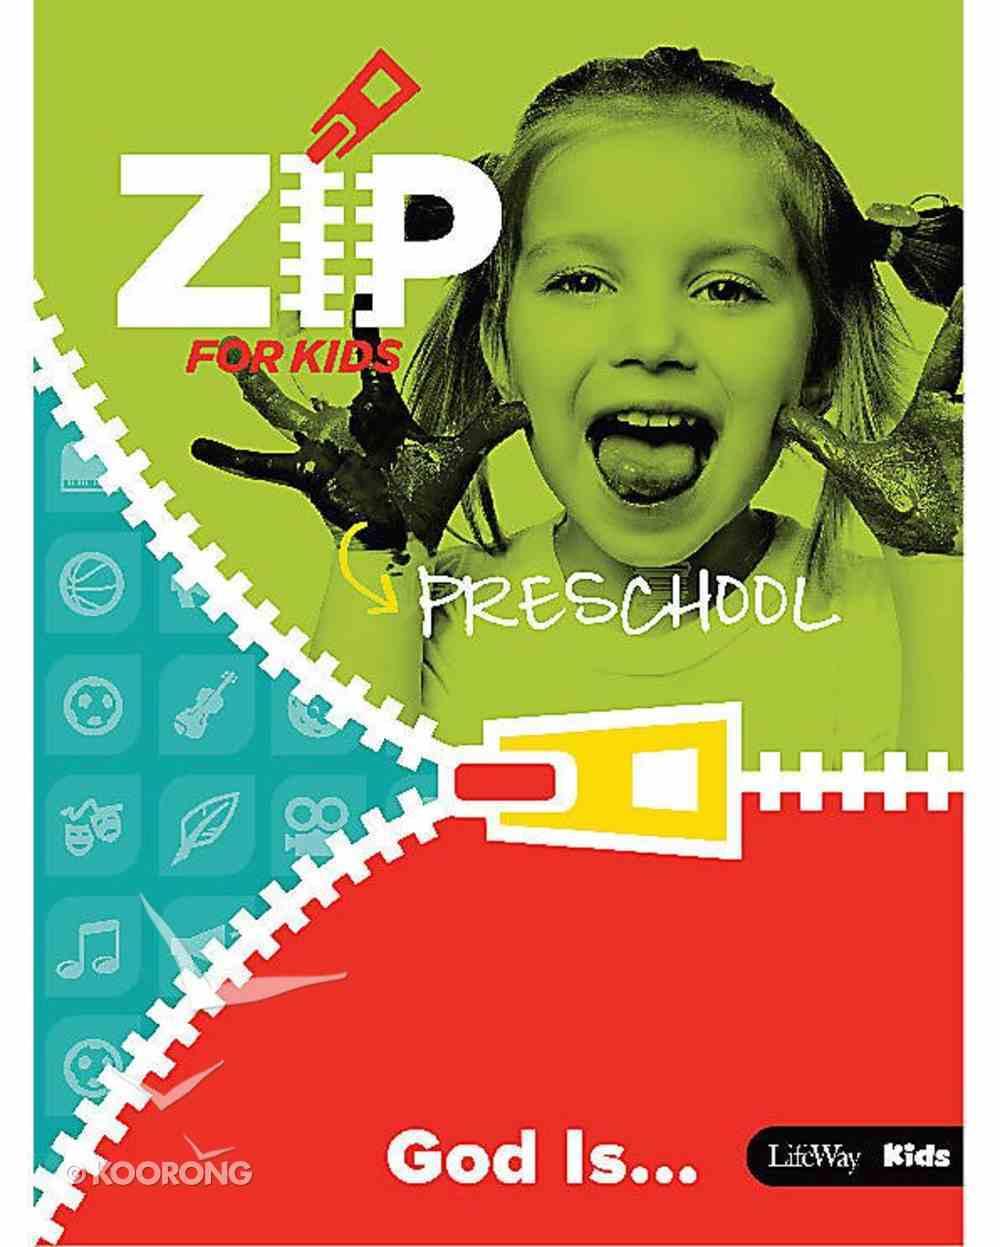 Vbs Zip For Kids: Zip For Preschool (Leader Kit) Pack